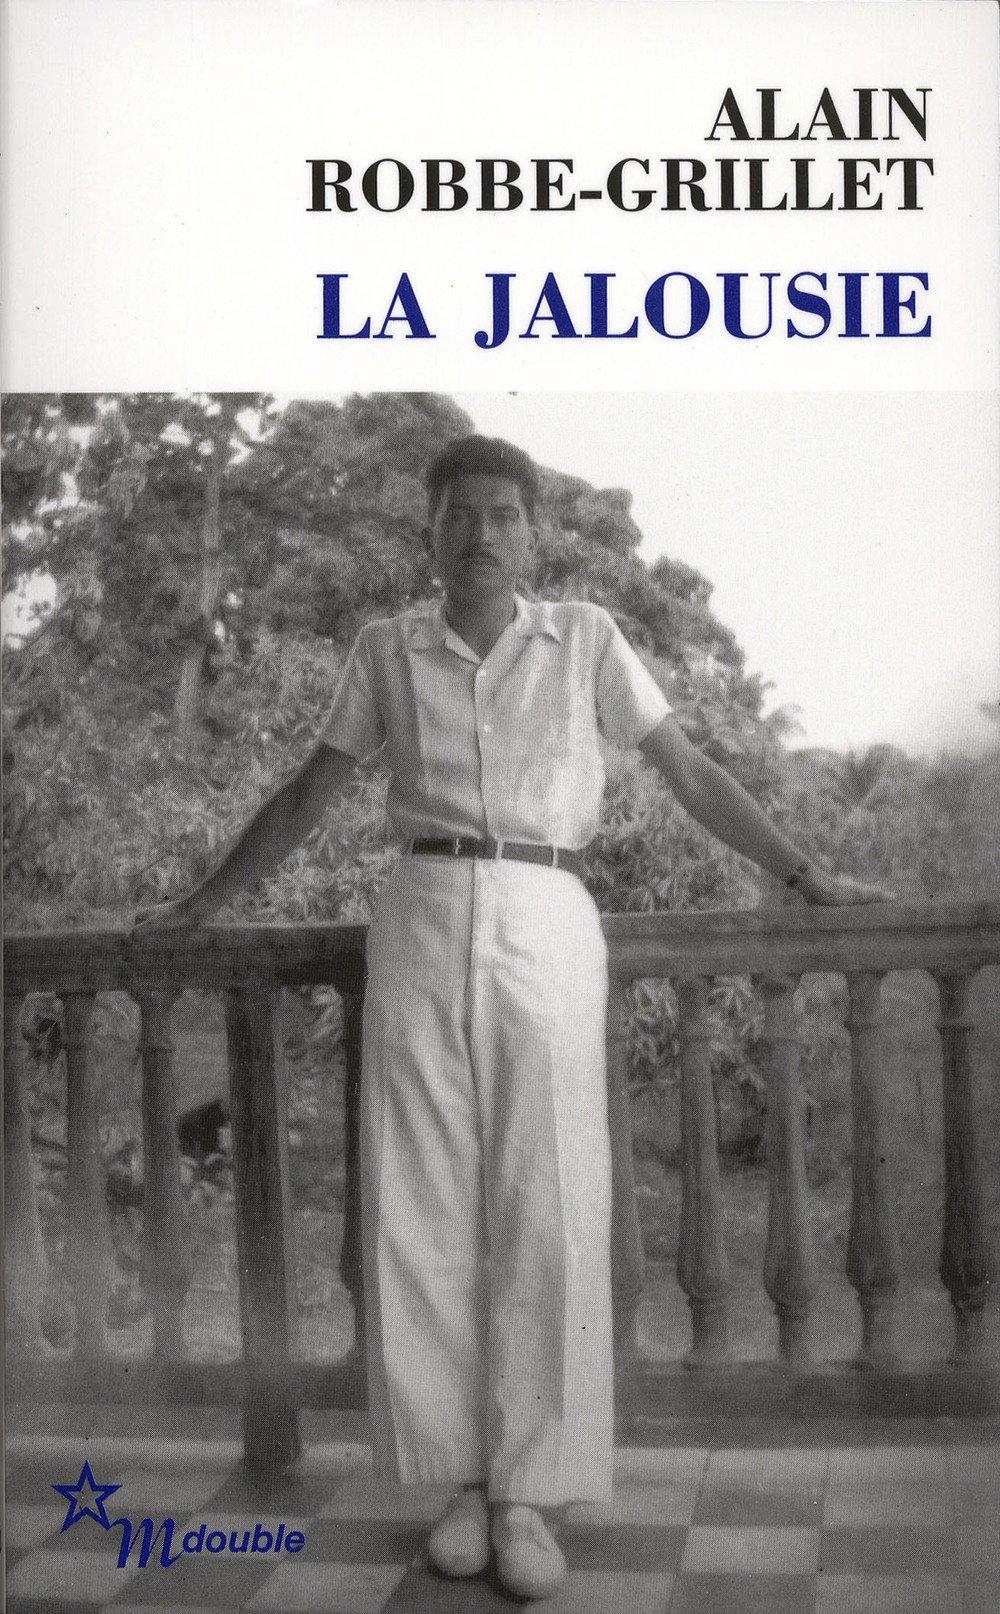 LA Jalousie: Amazon.co.uk: Alain Robbe-Grillet: 9782707321879: Books